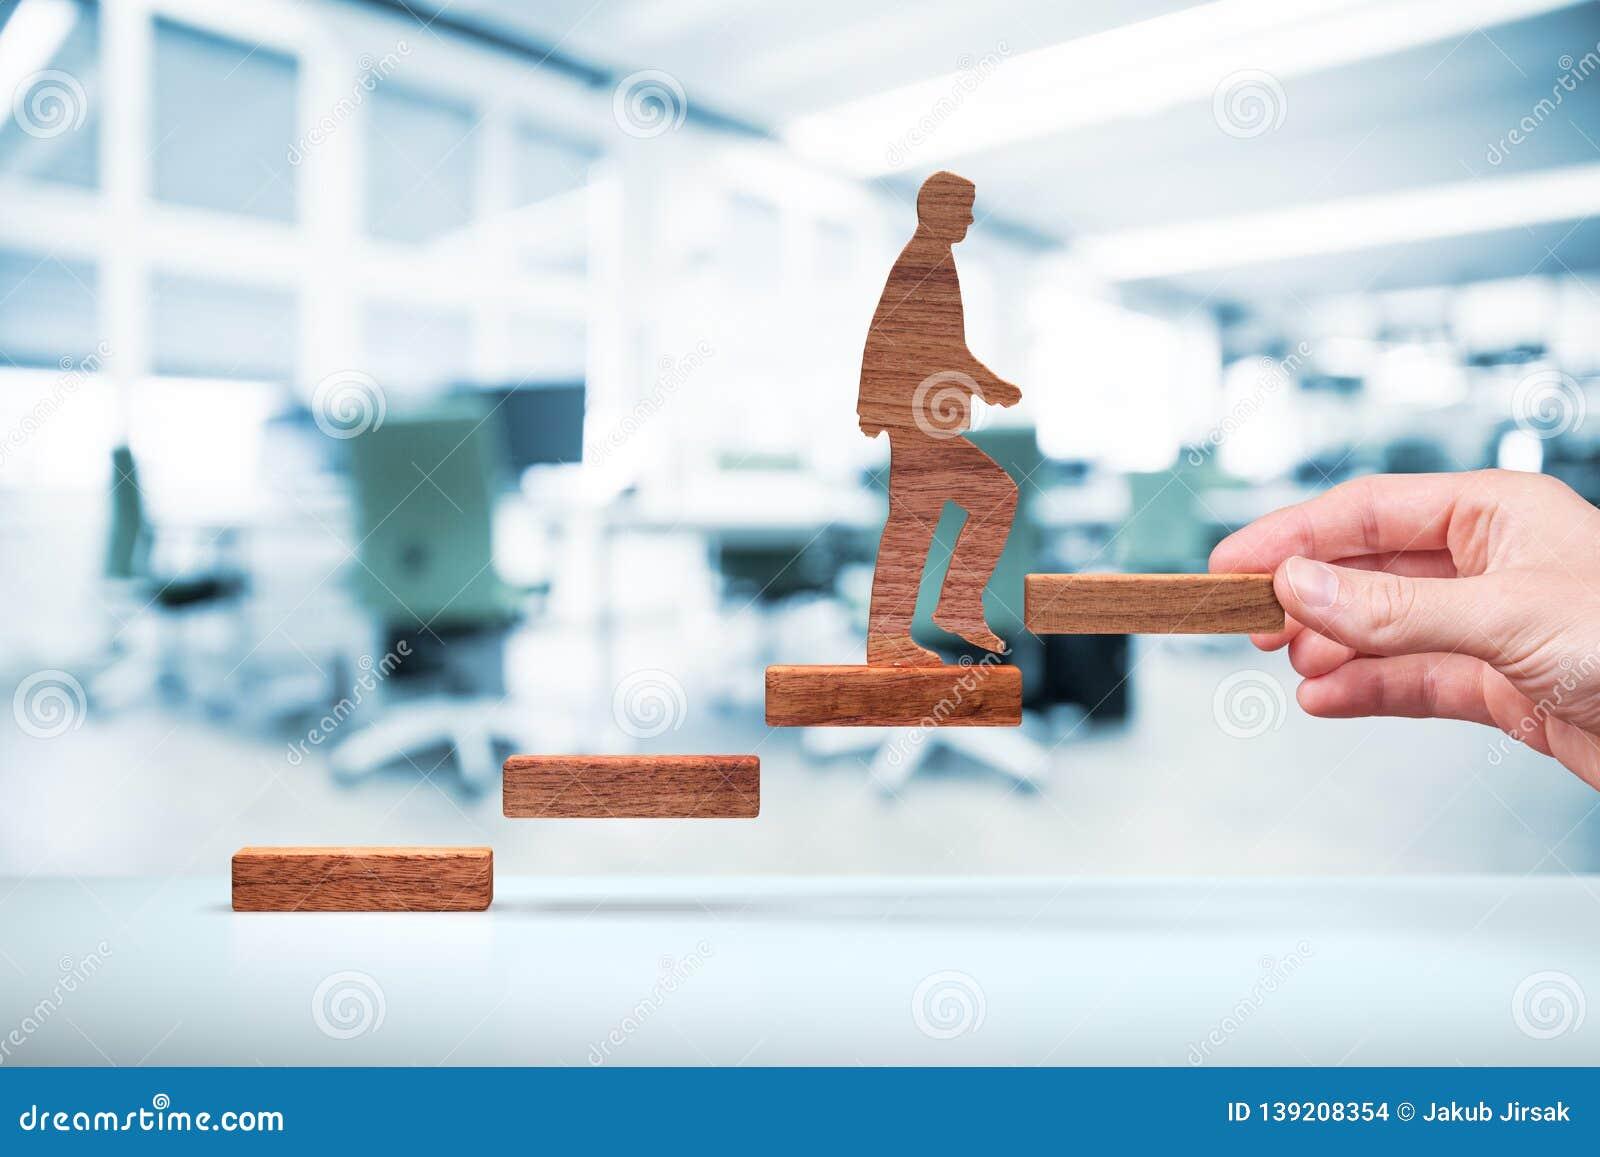 Personal Development Motivation Stock Photo - Image of